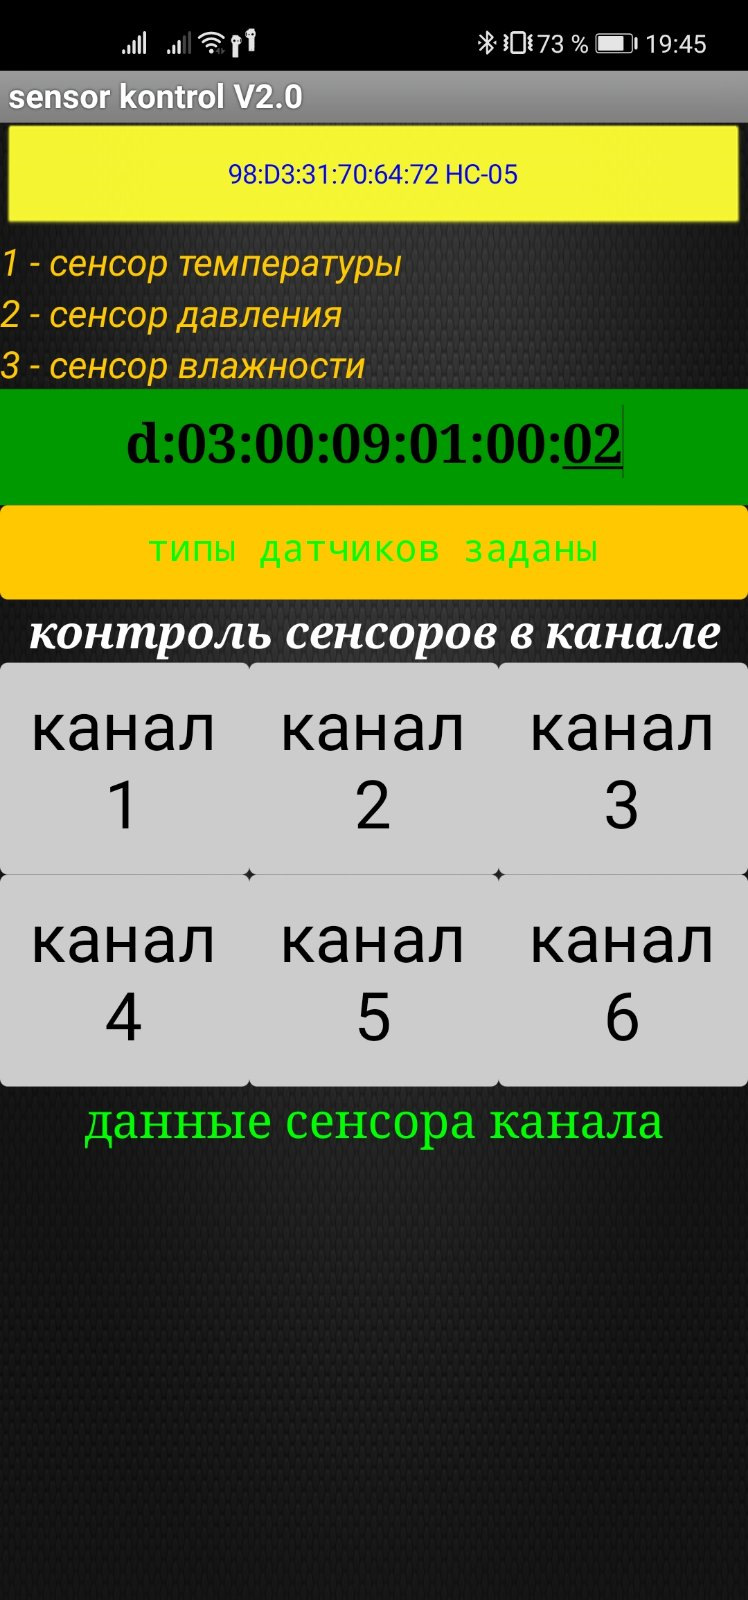 THNWdfNkNTRhCjkmo1LVcNDDw98-960.jpg